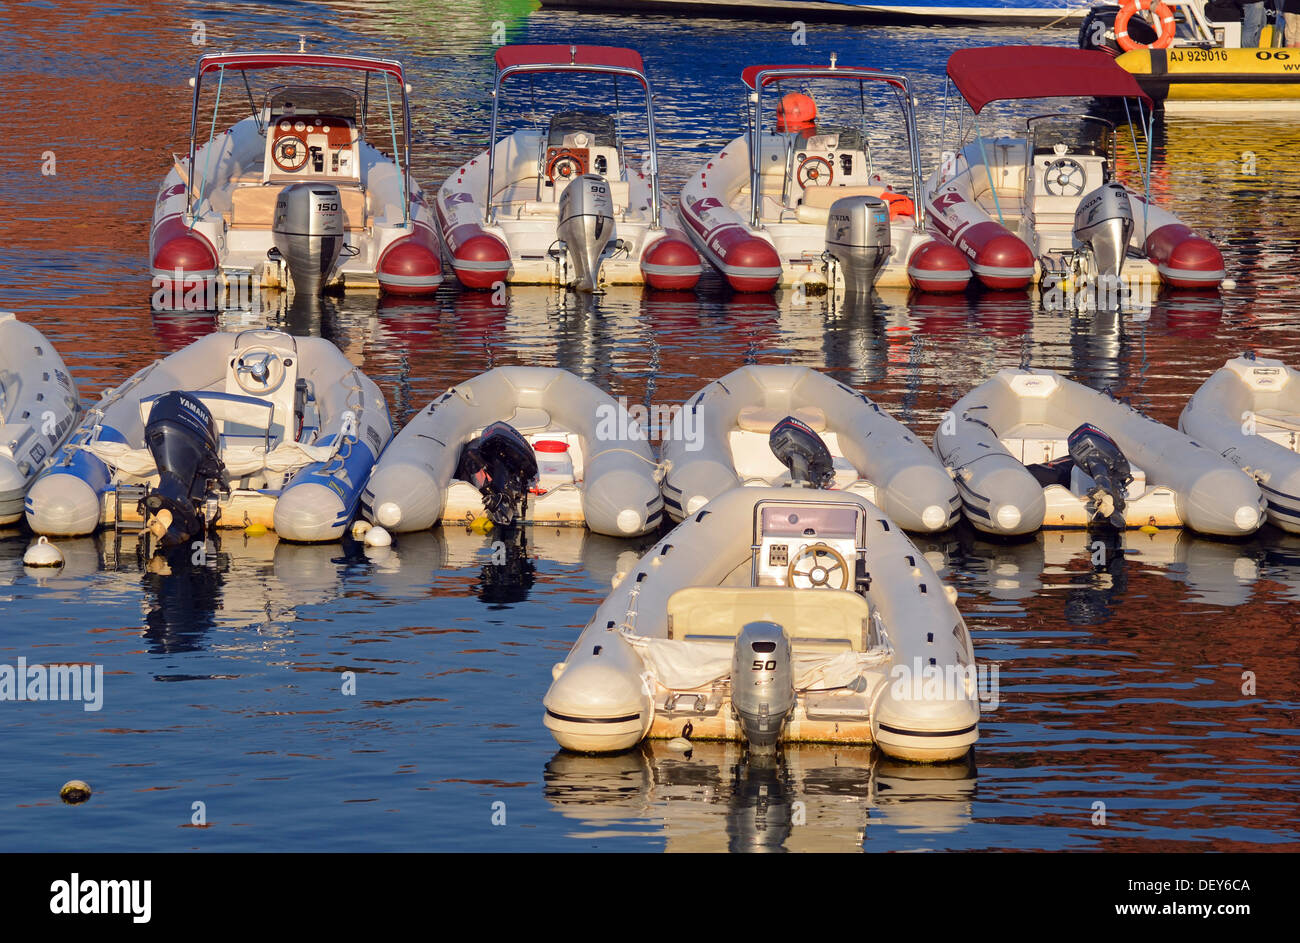 Inflatable boats with outboard motors in the harbor of Porto, Guaita, Porto, Corsica, France - Stock Image